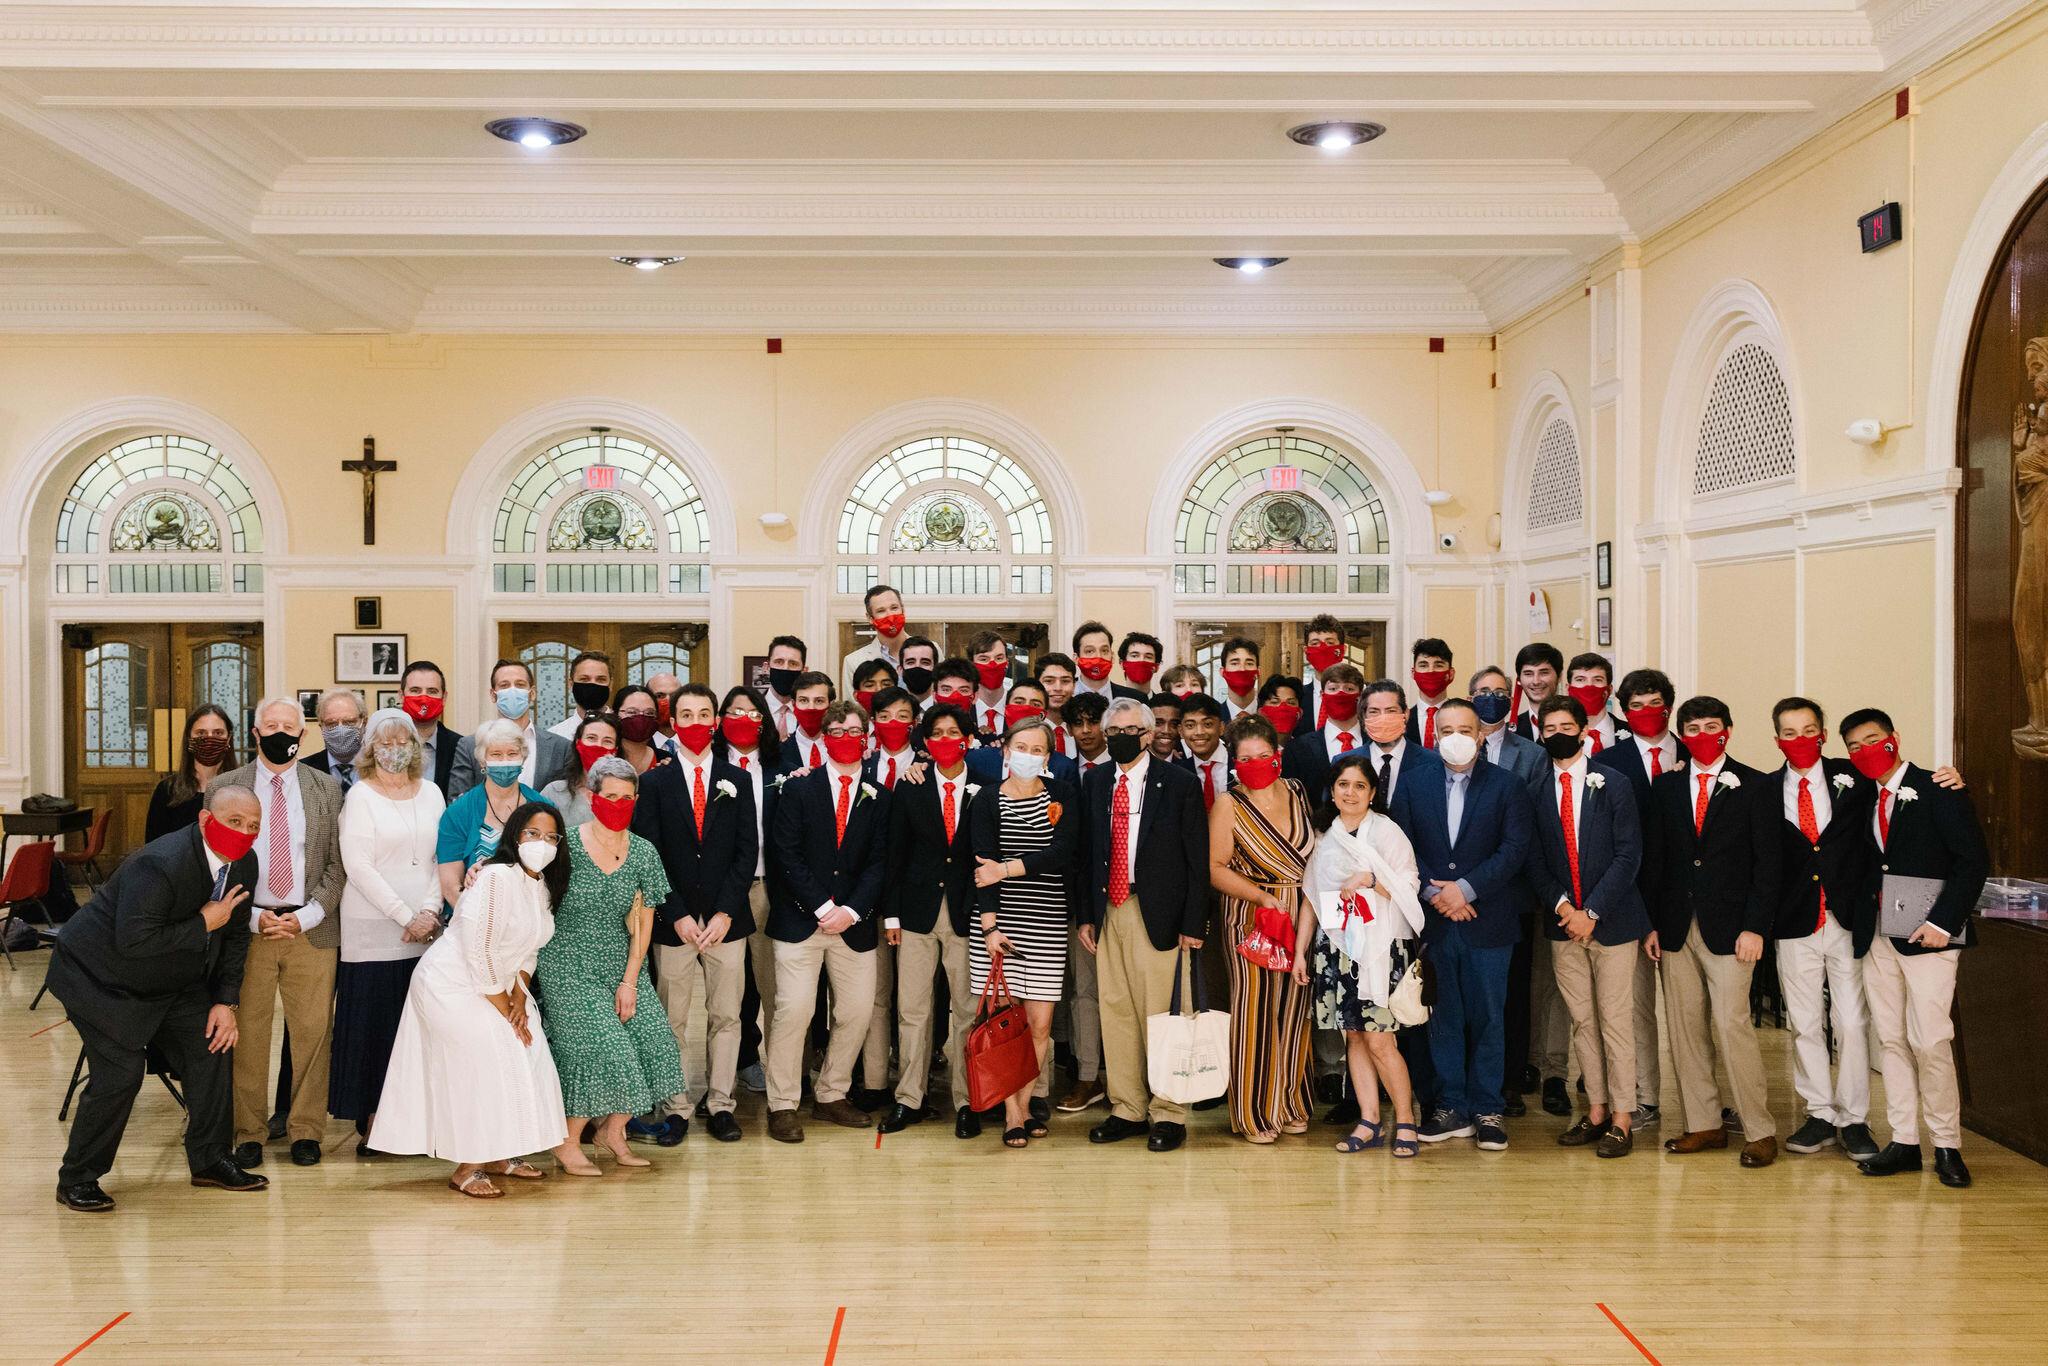 20210615 _browning_graduation_0053.jpg